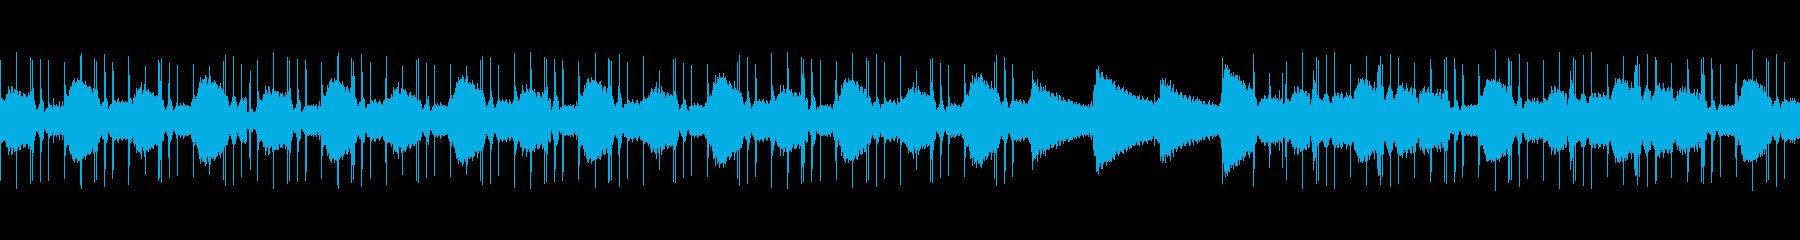 LoFiHipHopのChillっぽい曲の再生済みの波形